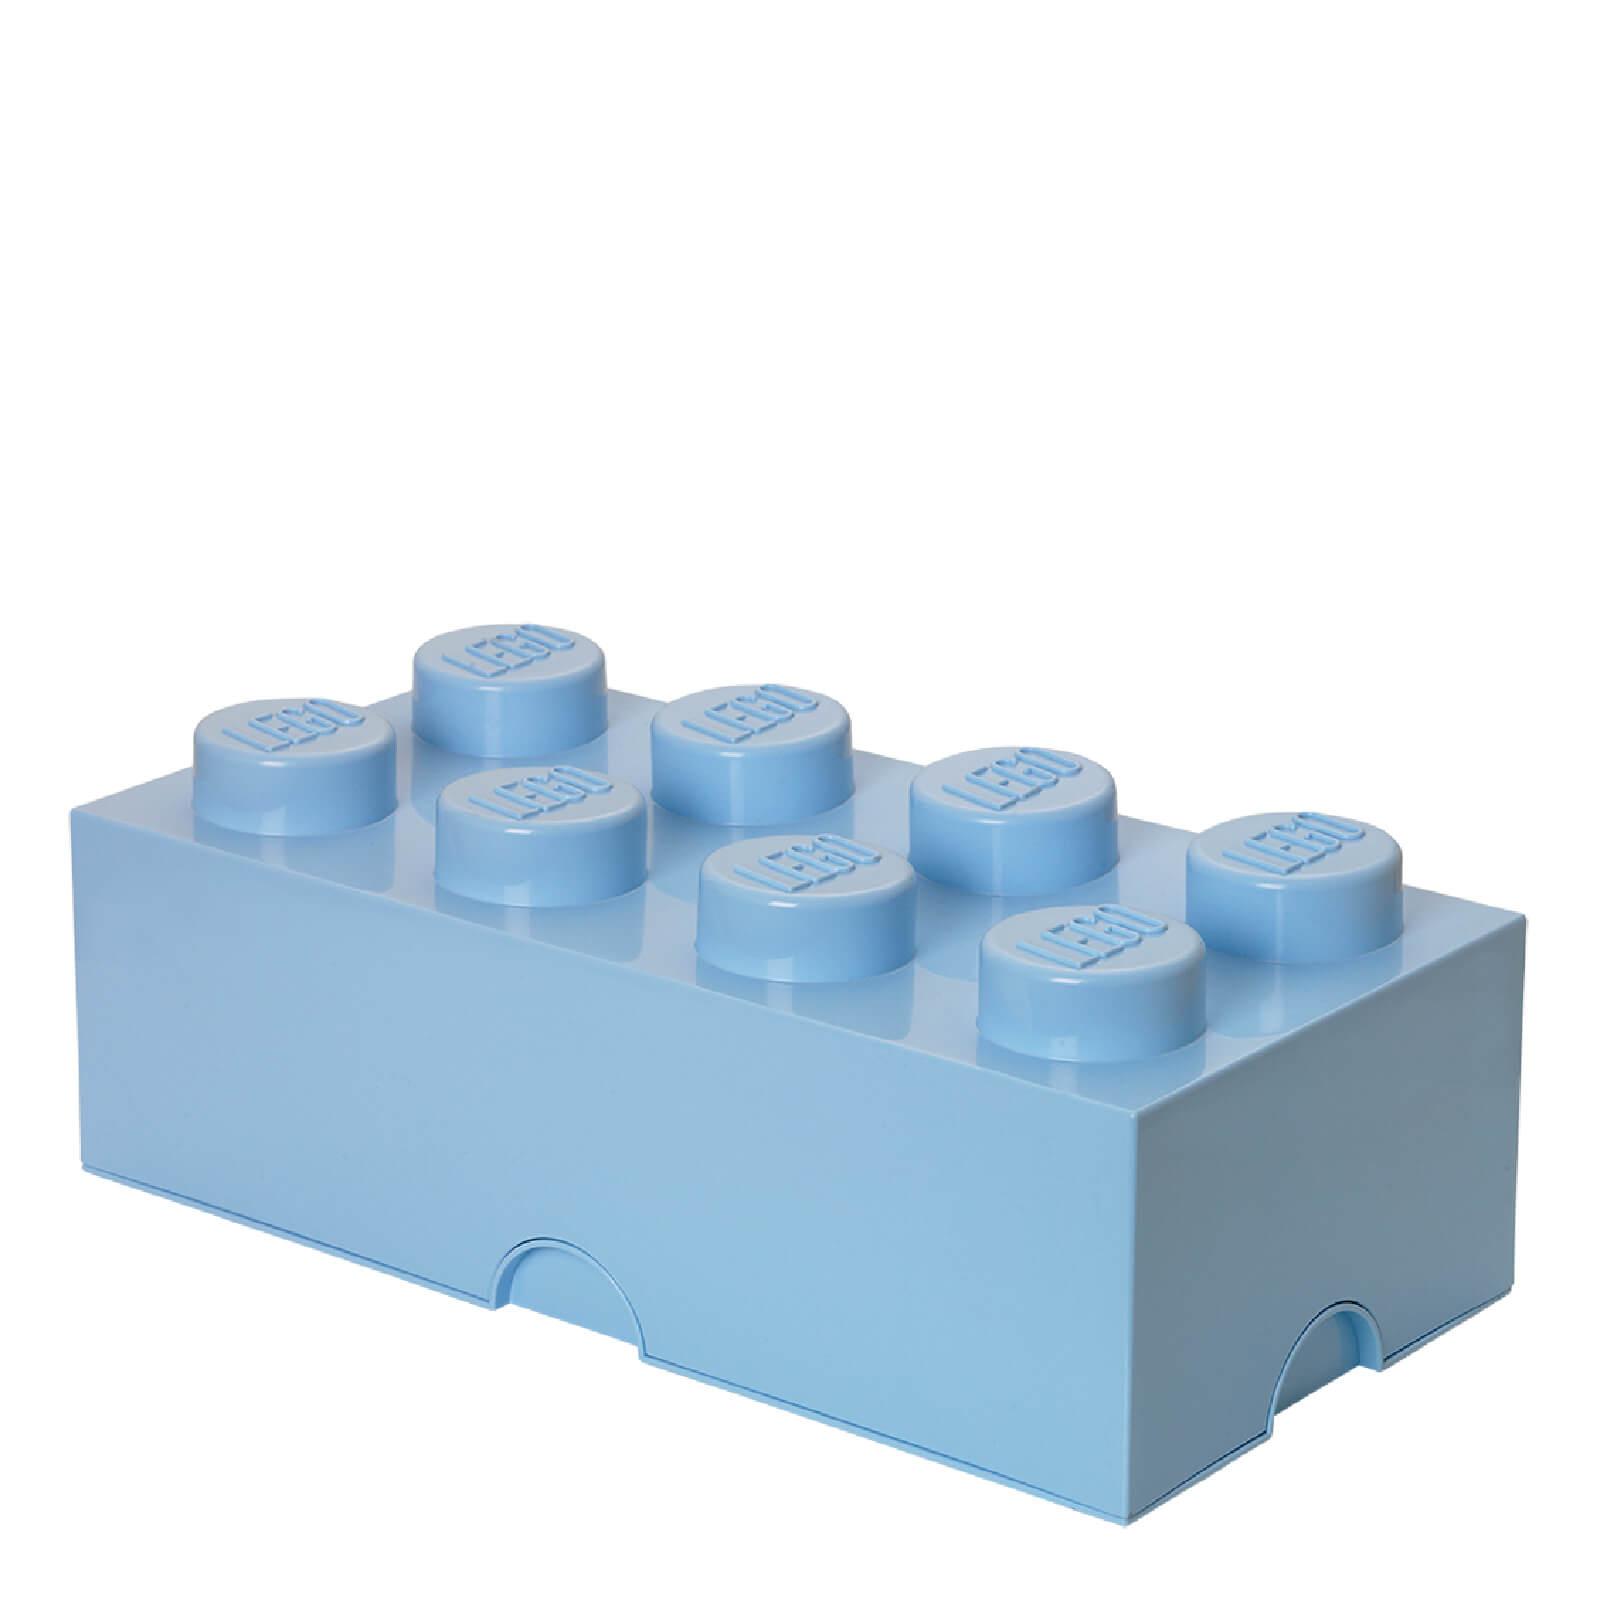 Lego Storage Brick 8 - Light Royal Blue